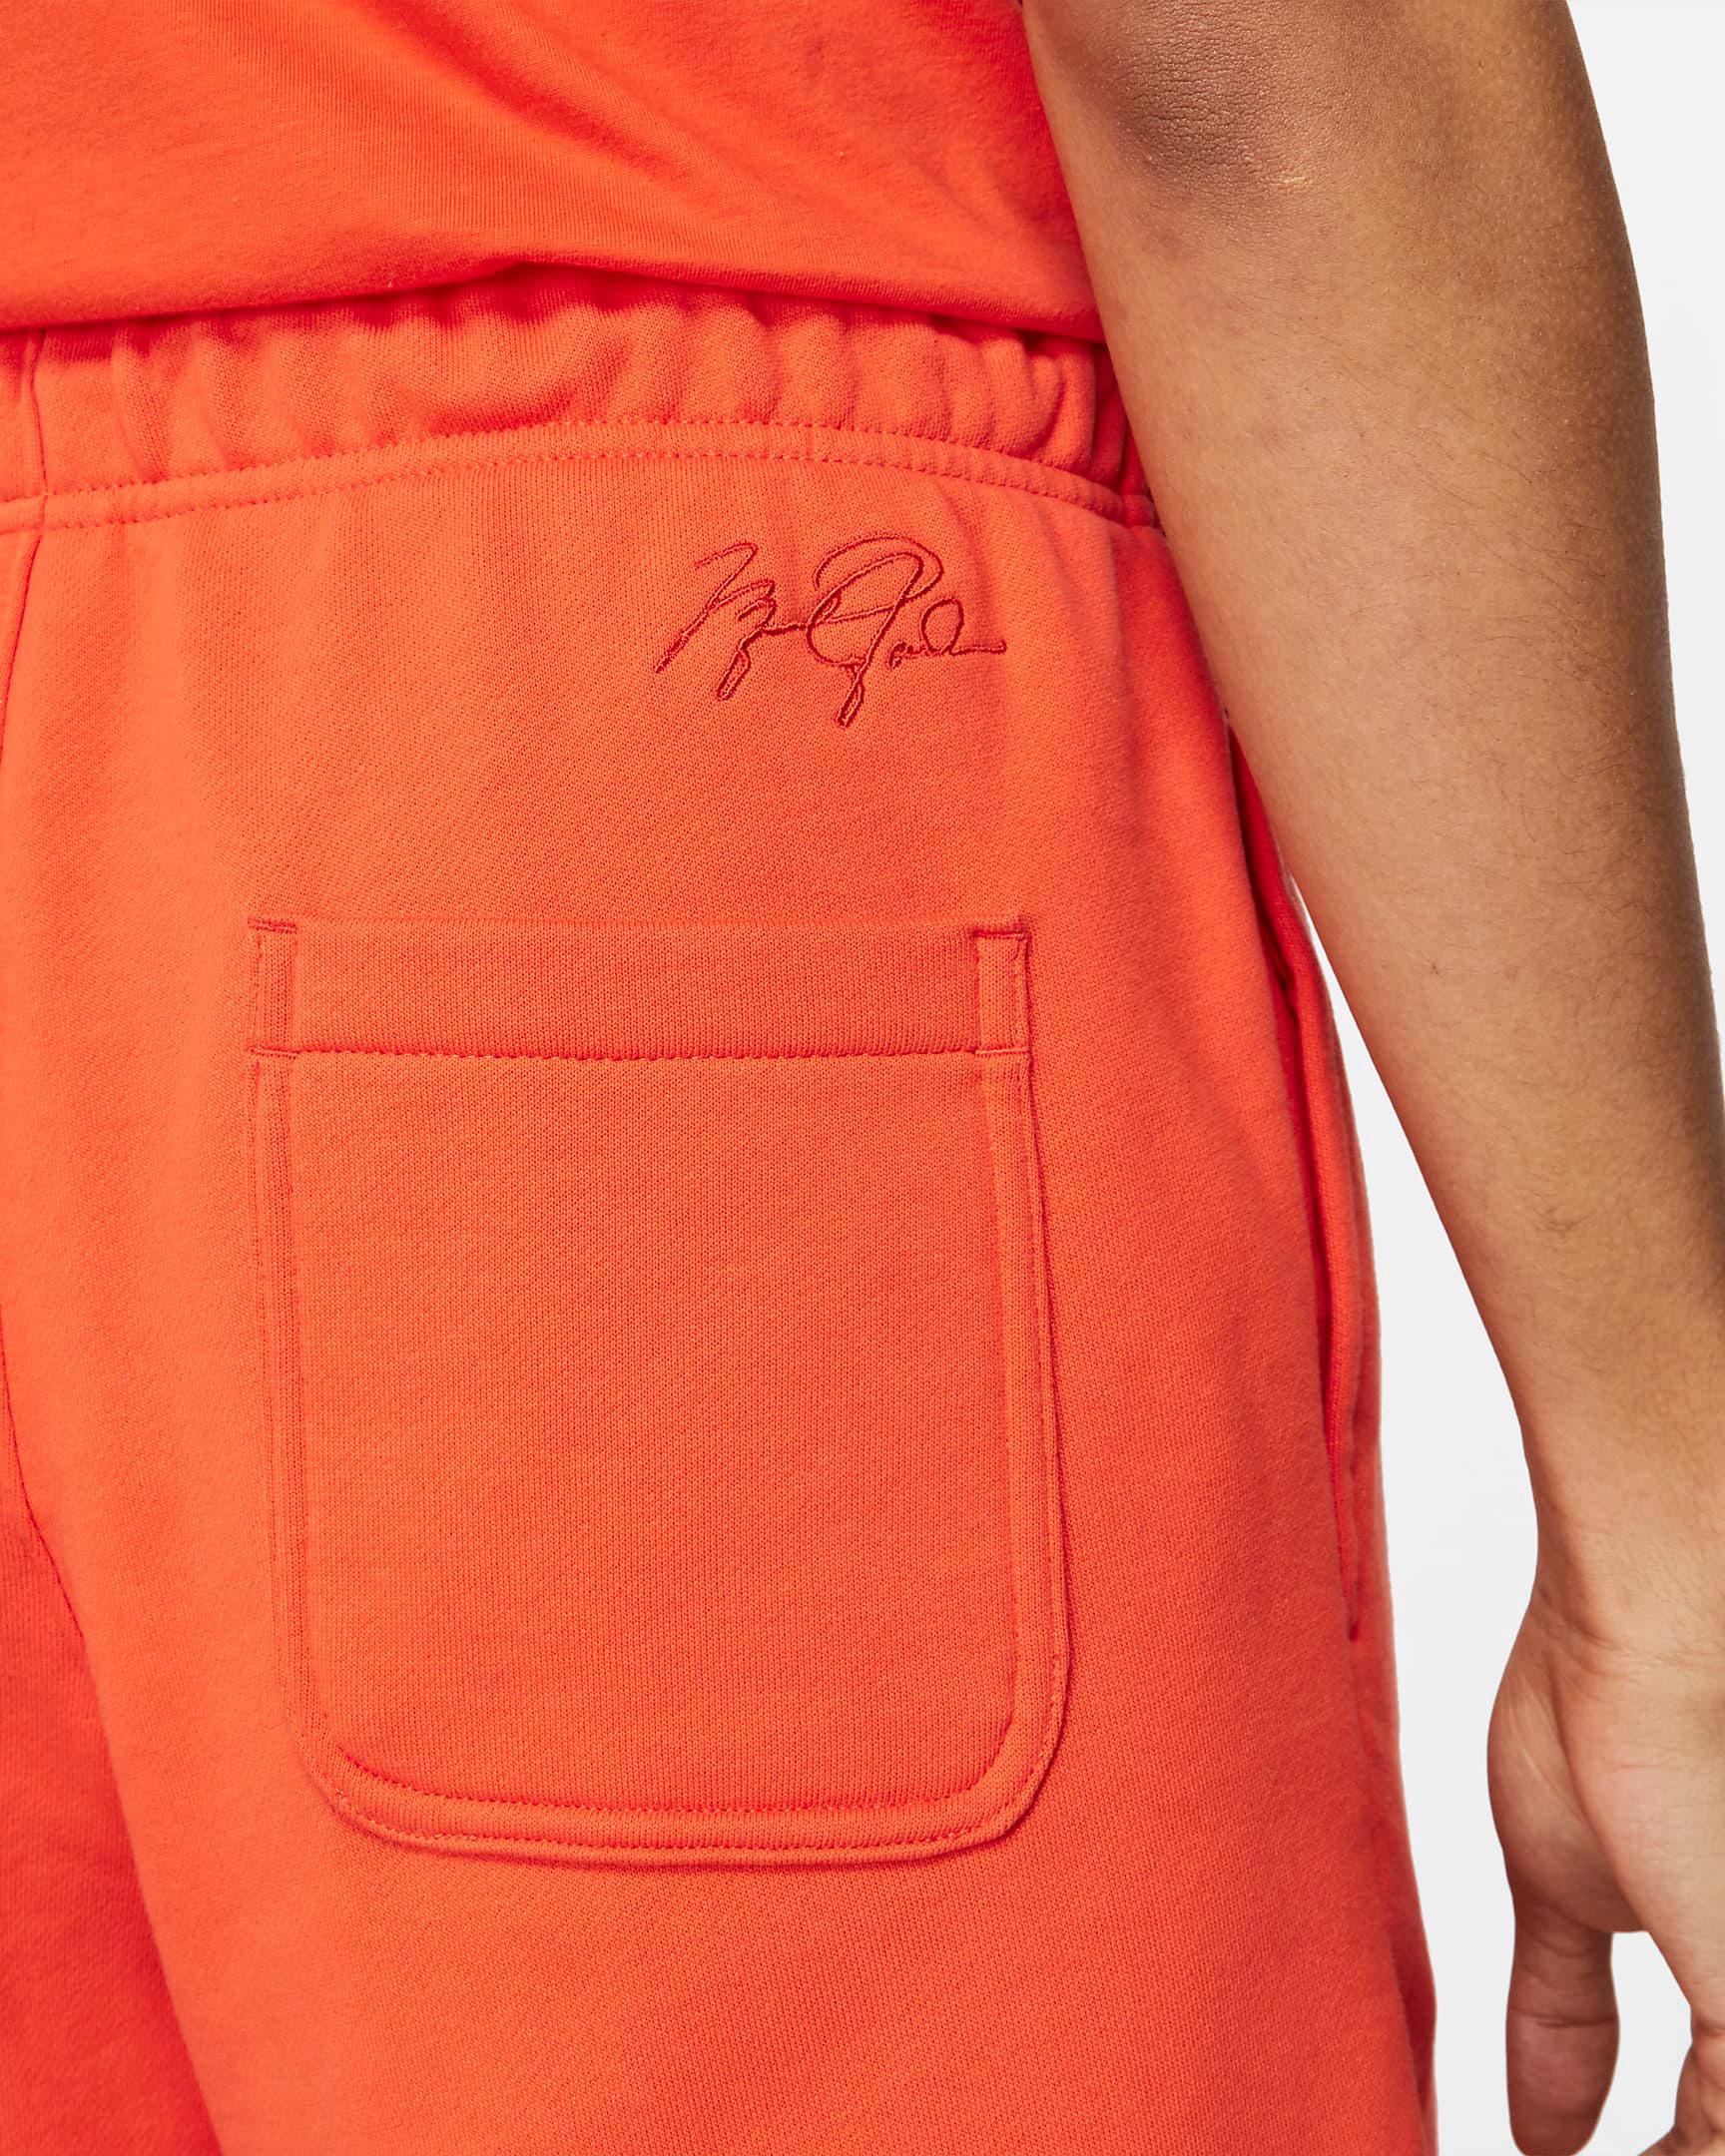 jordan-orange-essential-fleece-shorts-4